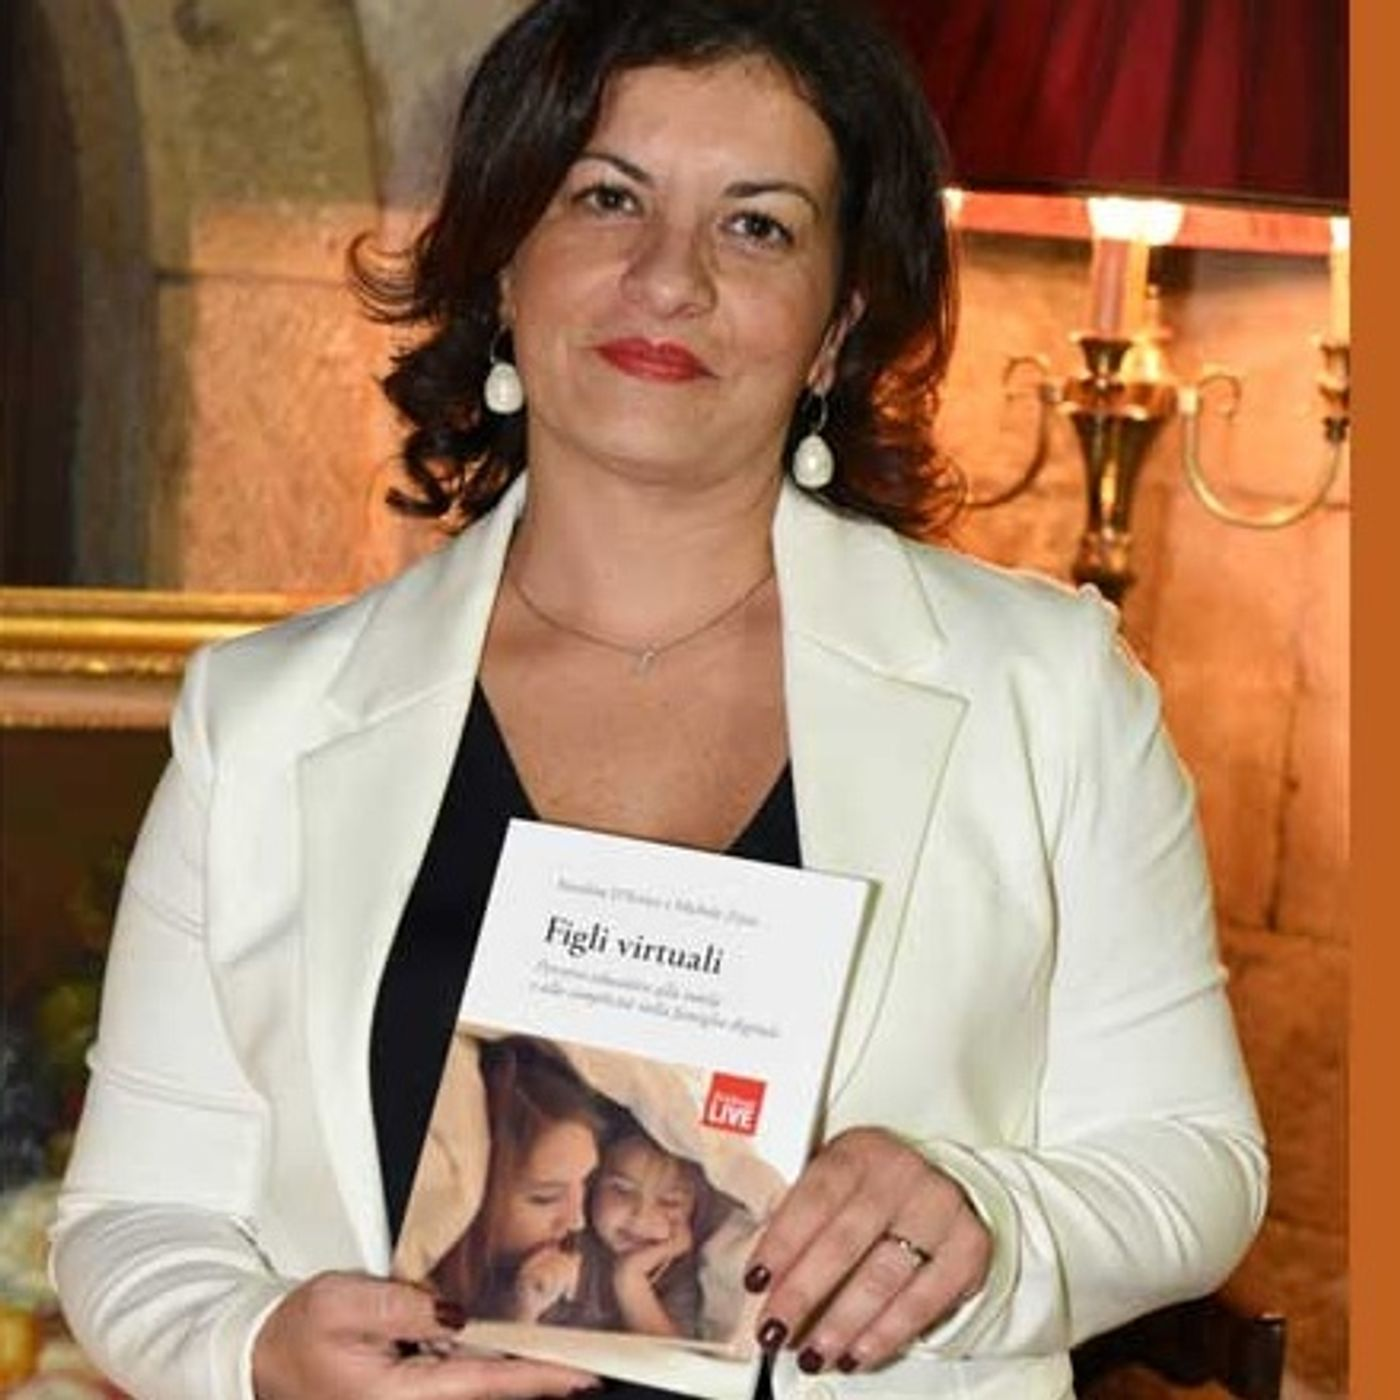 #85 10 social comandamenti: intervista ad Annalisa D'Errico